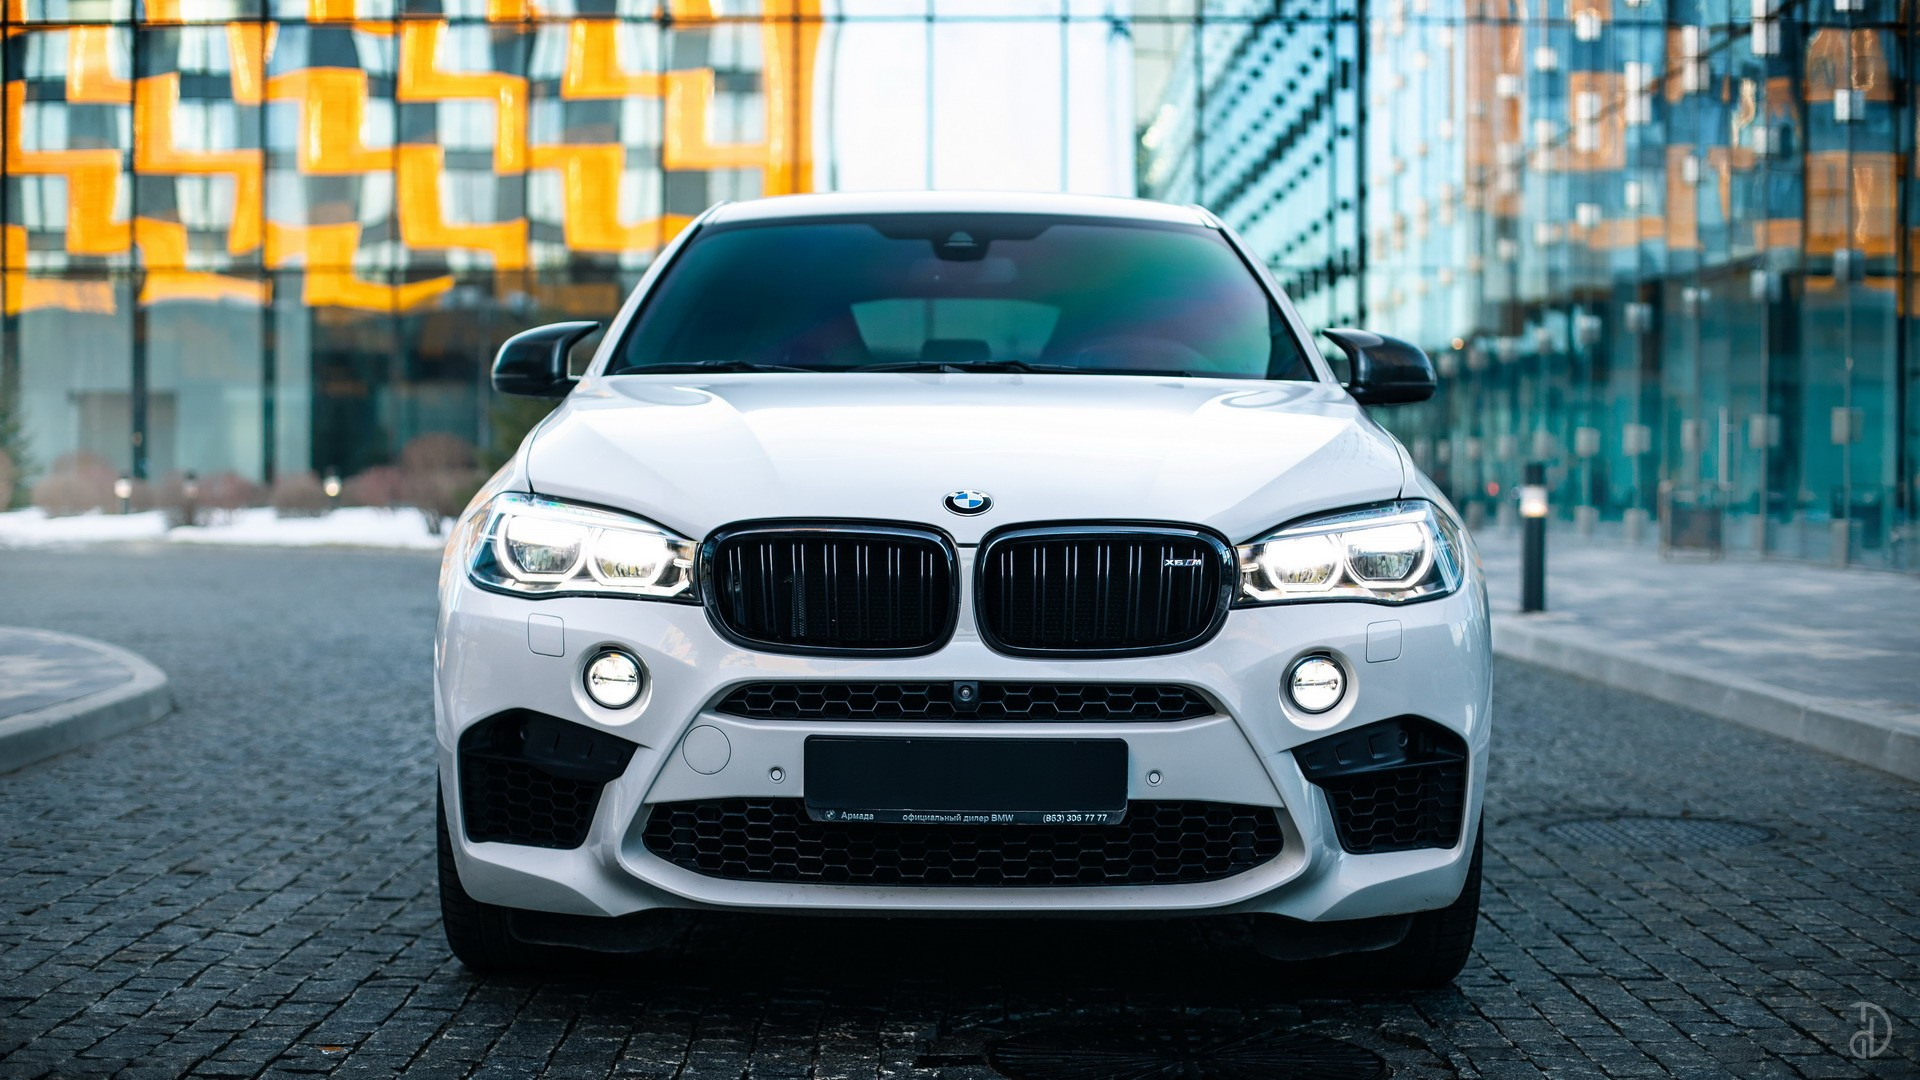 Аренда BMW X6M в Сочи. Фото 2